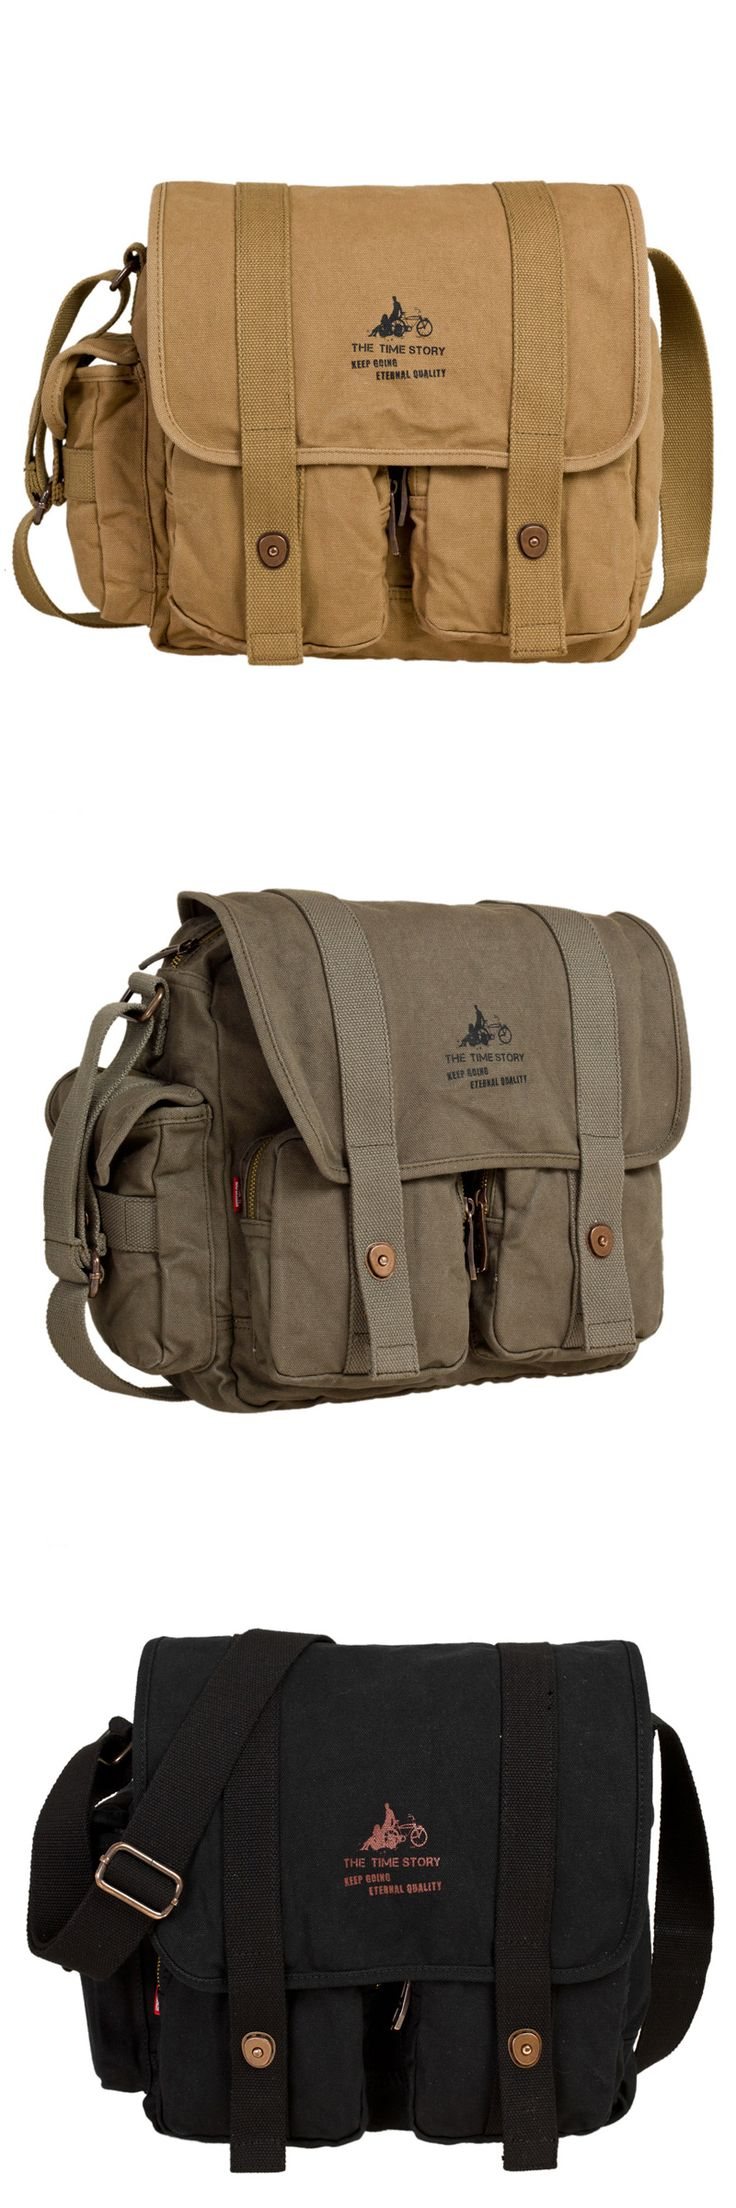 38$ * High quality canvas Men's Vintage Canvas Shoulder Messenger Hiking Tool Bag Satchel #canvas #hiking #tool #bag #shoulder